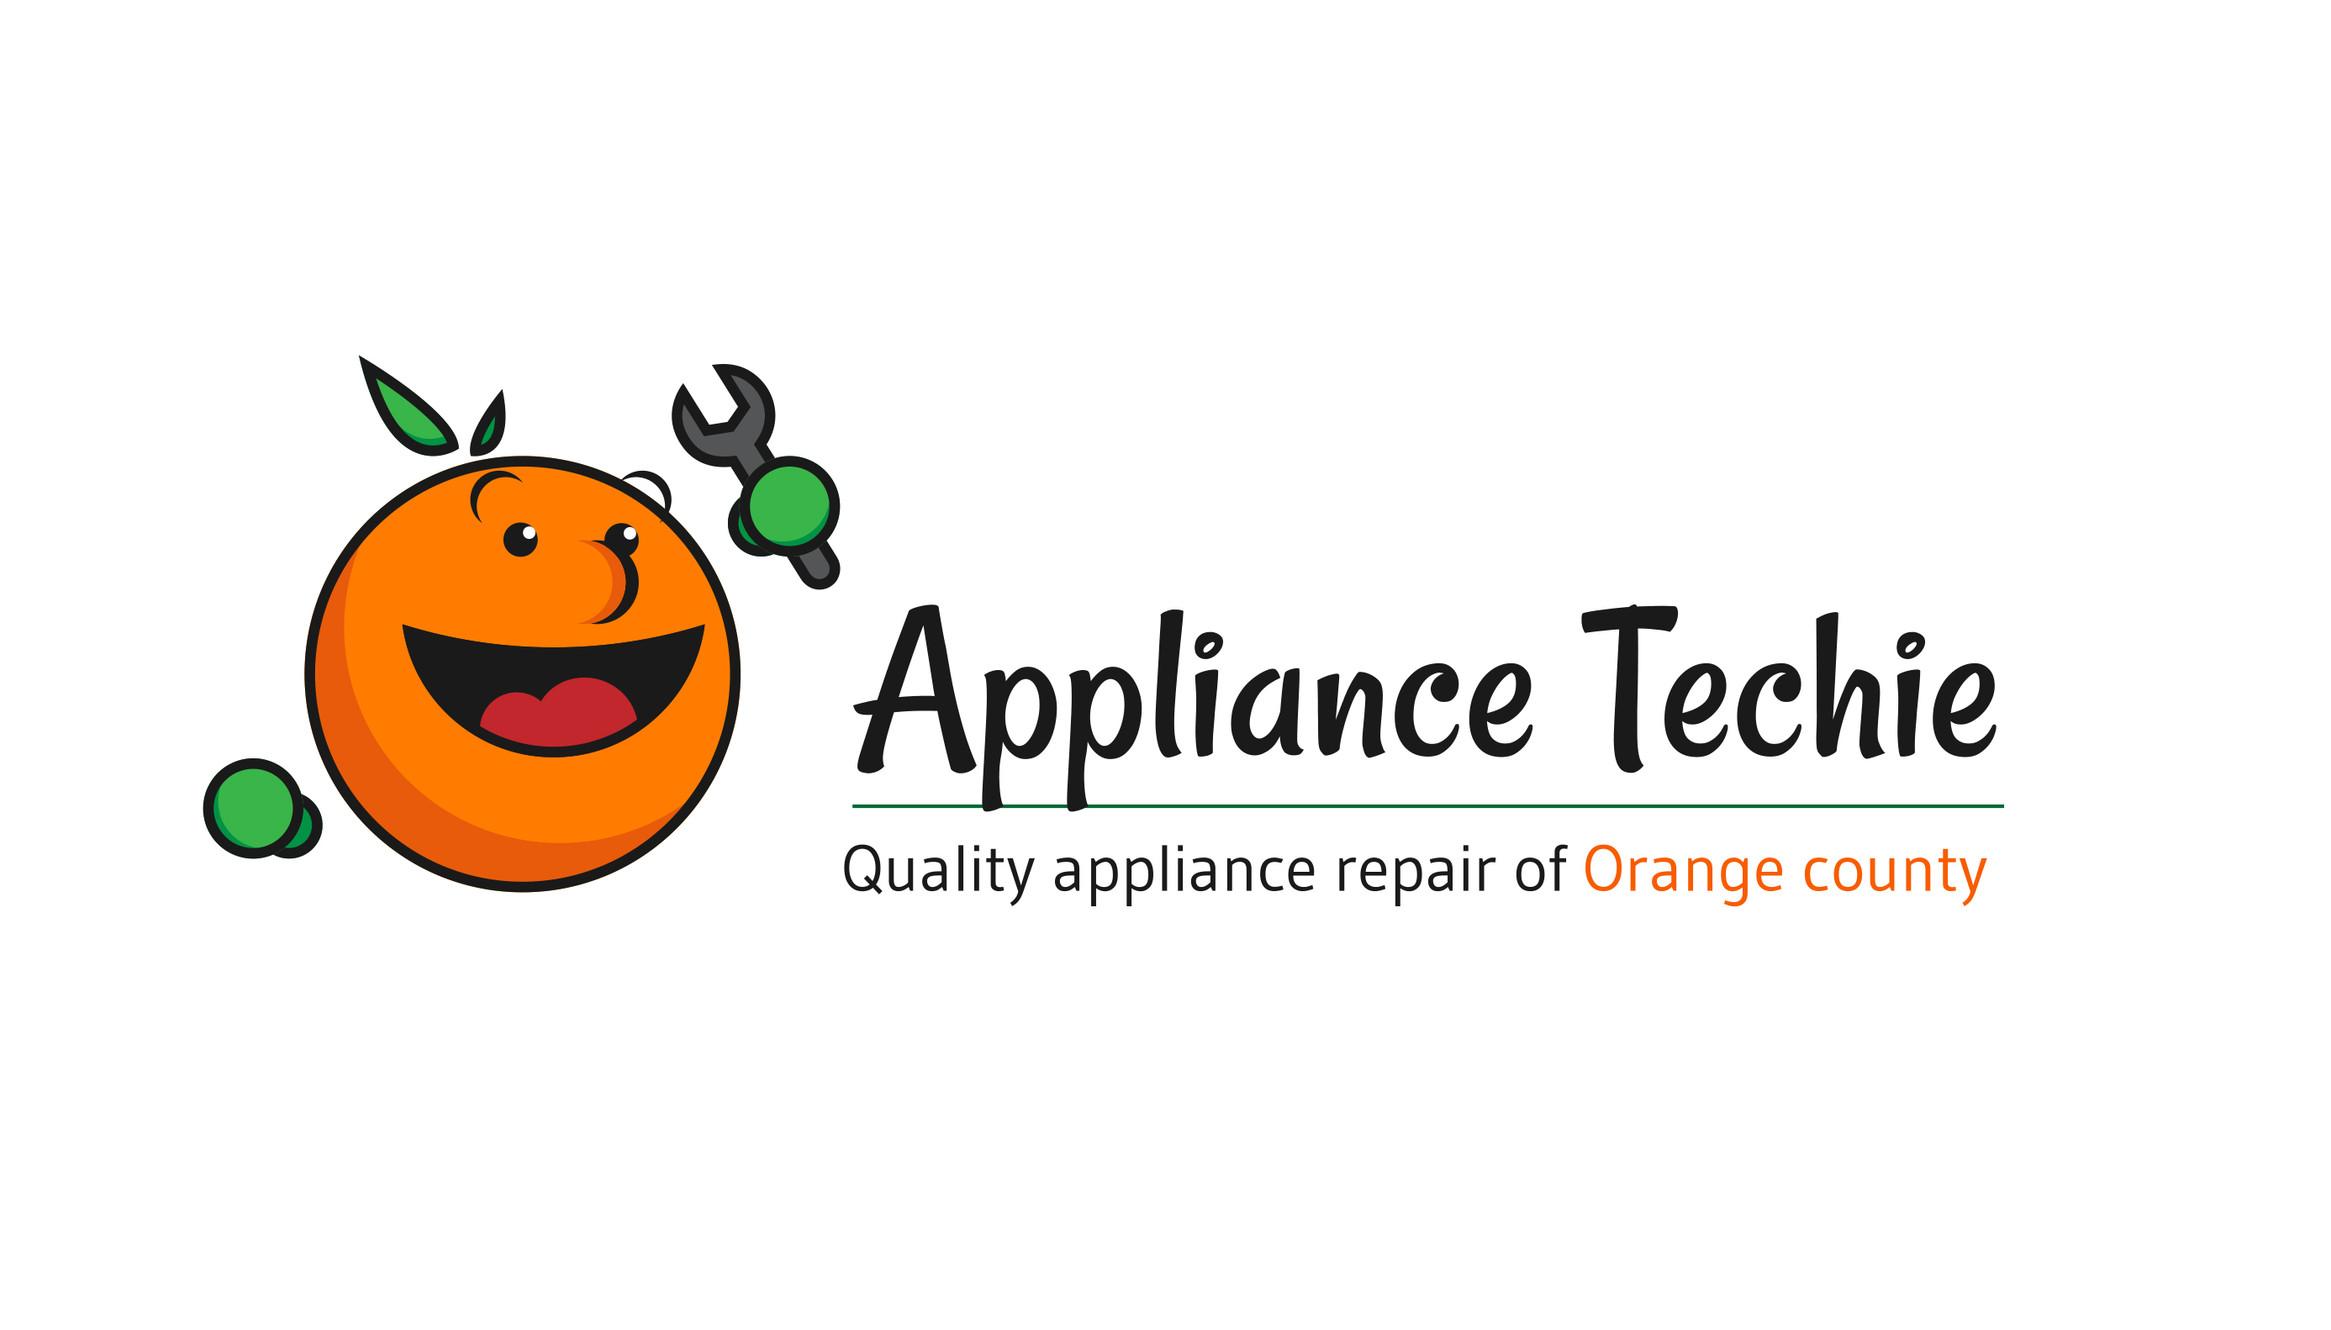 Appliance Techie Quality Appliance Repair